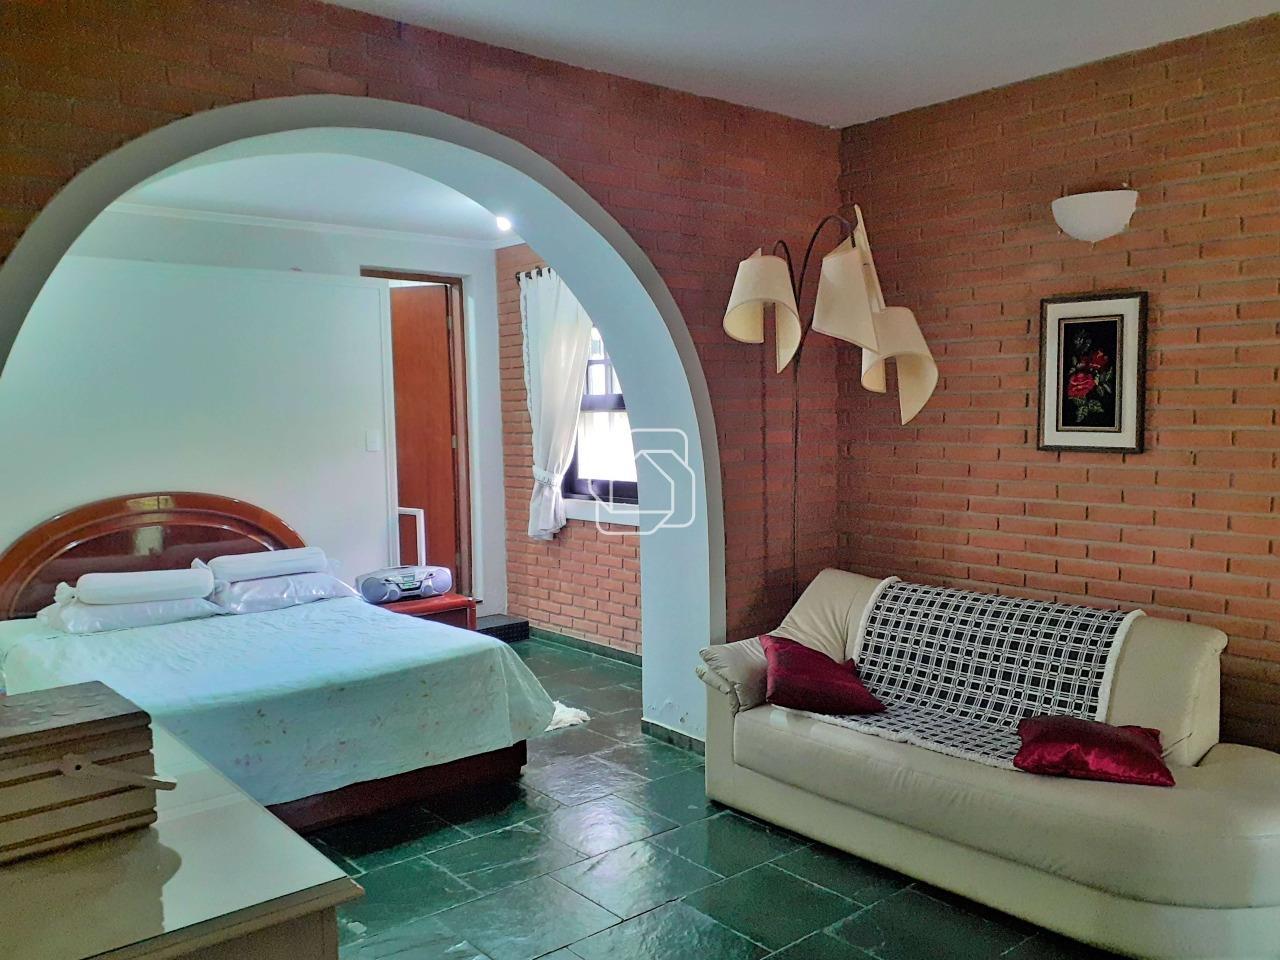 Casa de Condomínio à venda no Lagos de Shanadu: Casa à venda no Condomínio Lagos de Shanadu - Indaiatuba/SP